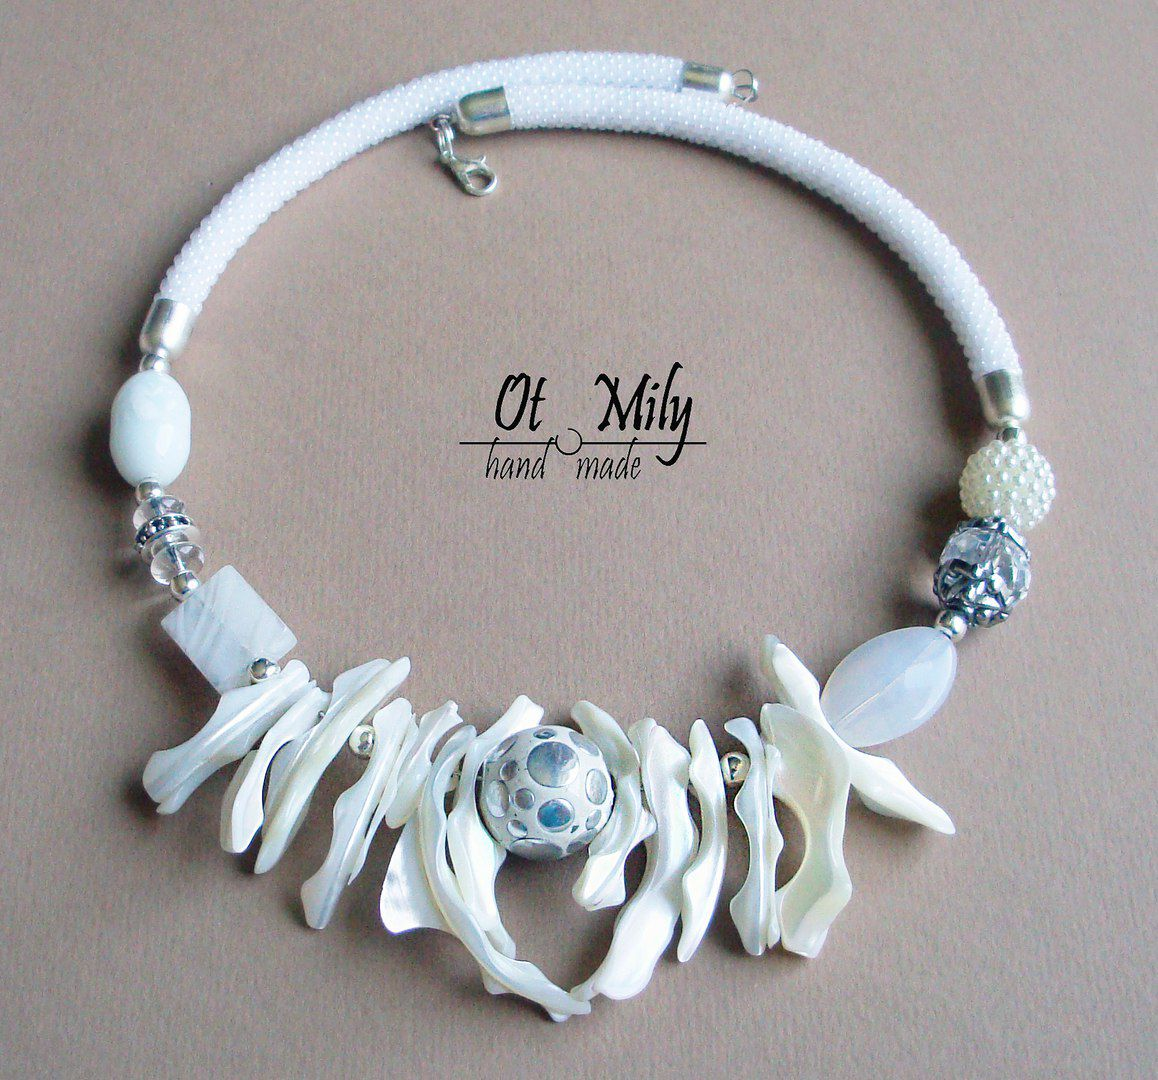 натуральные камни колье перламутр жгут бисер ожерелье